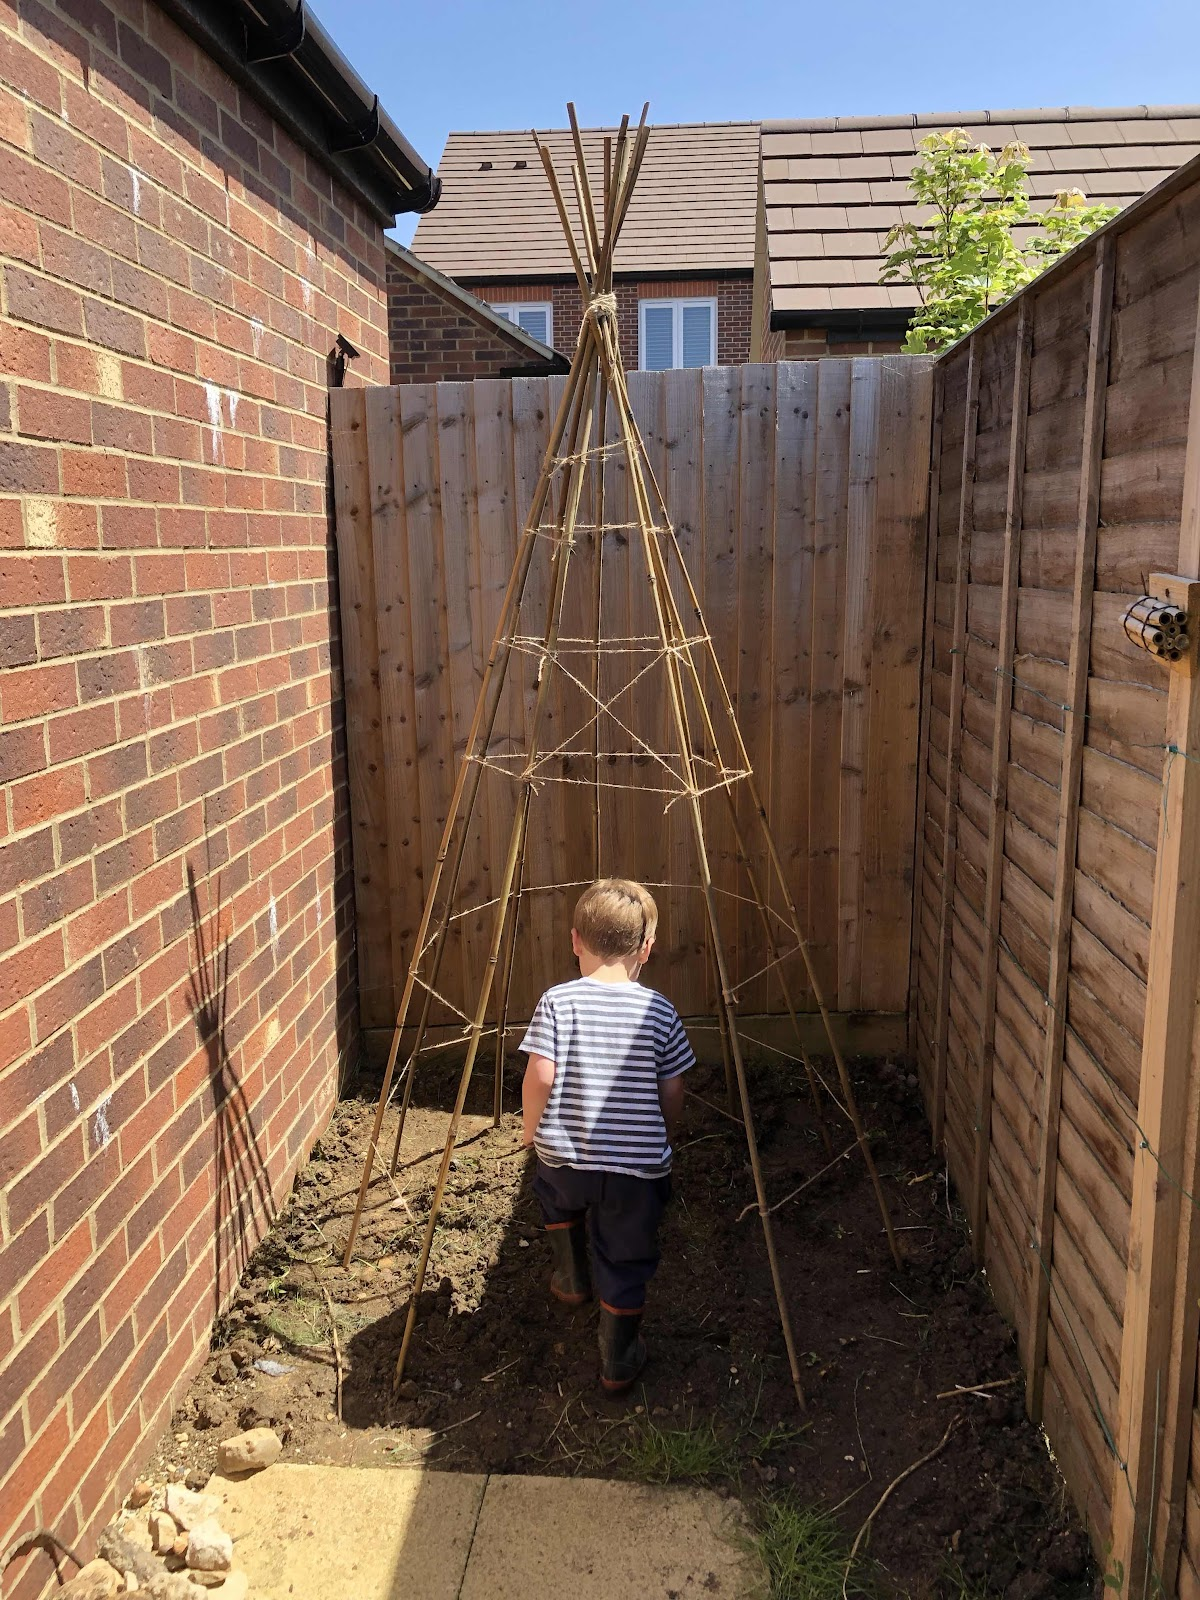 children's play teepee